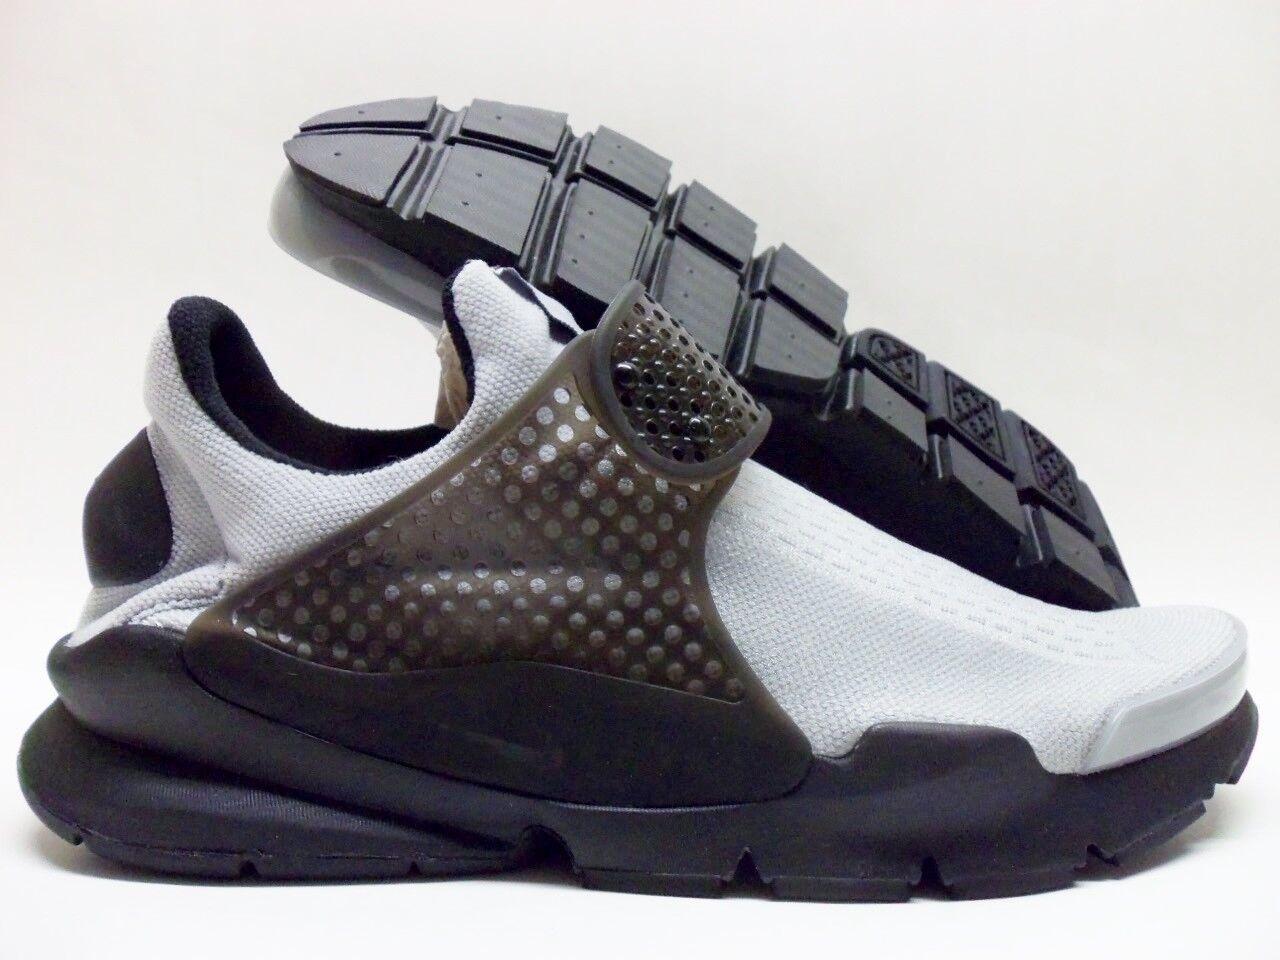 Nike uomini sock dardo id forte grigio / nero taglia uomini Nike '10 13790b